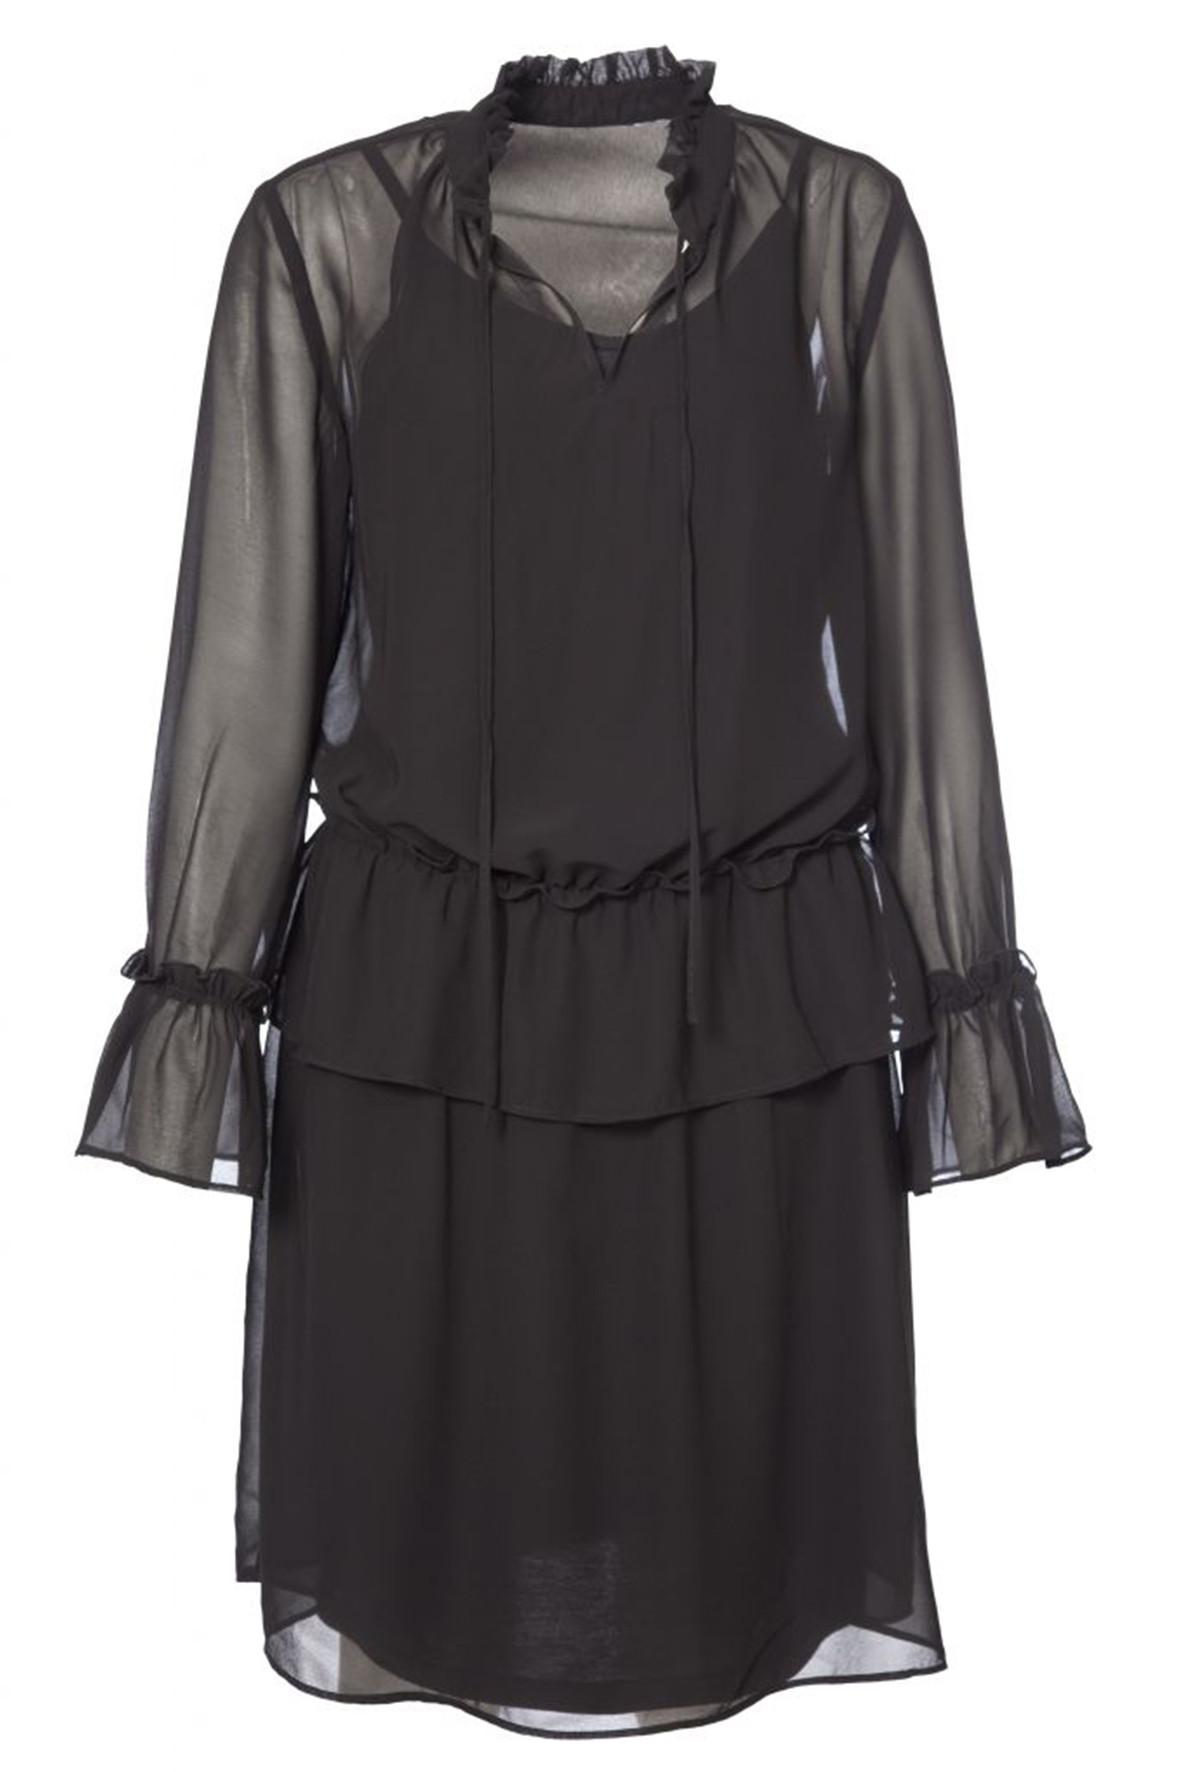 CADDIS FLY Lacuna Dress